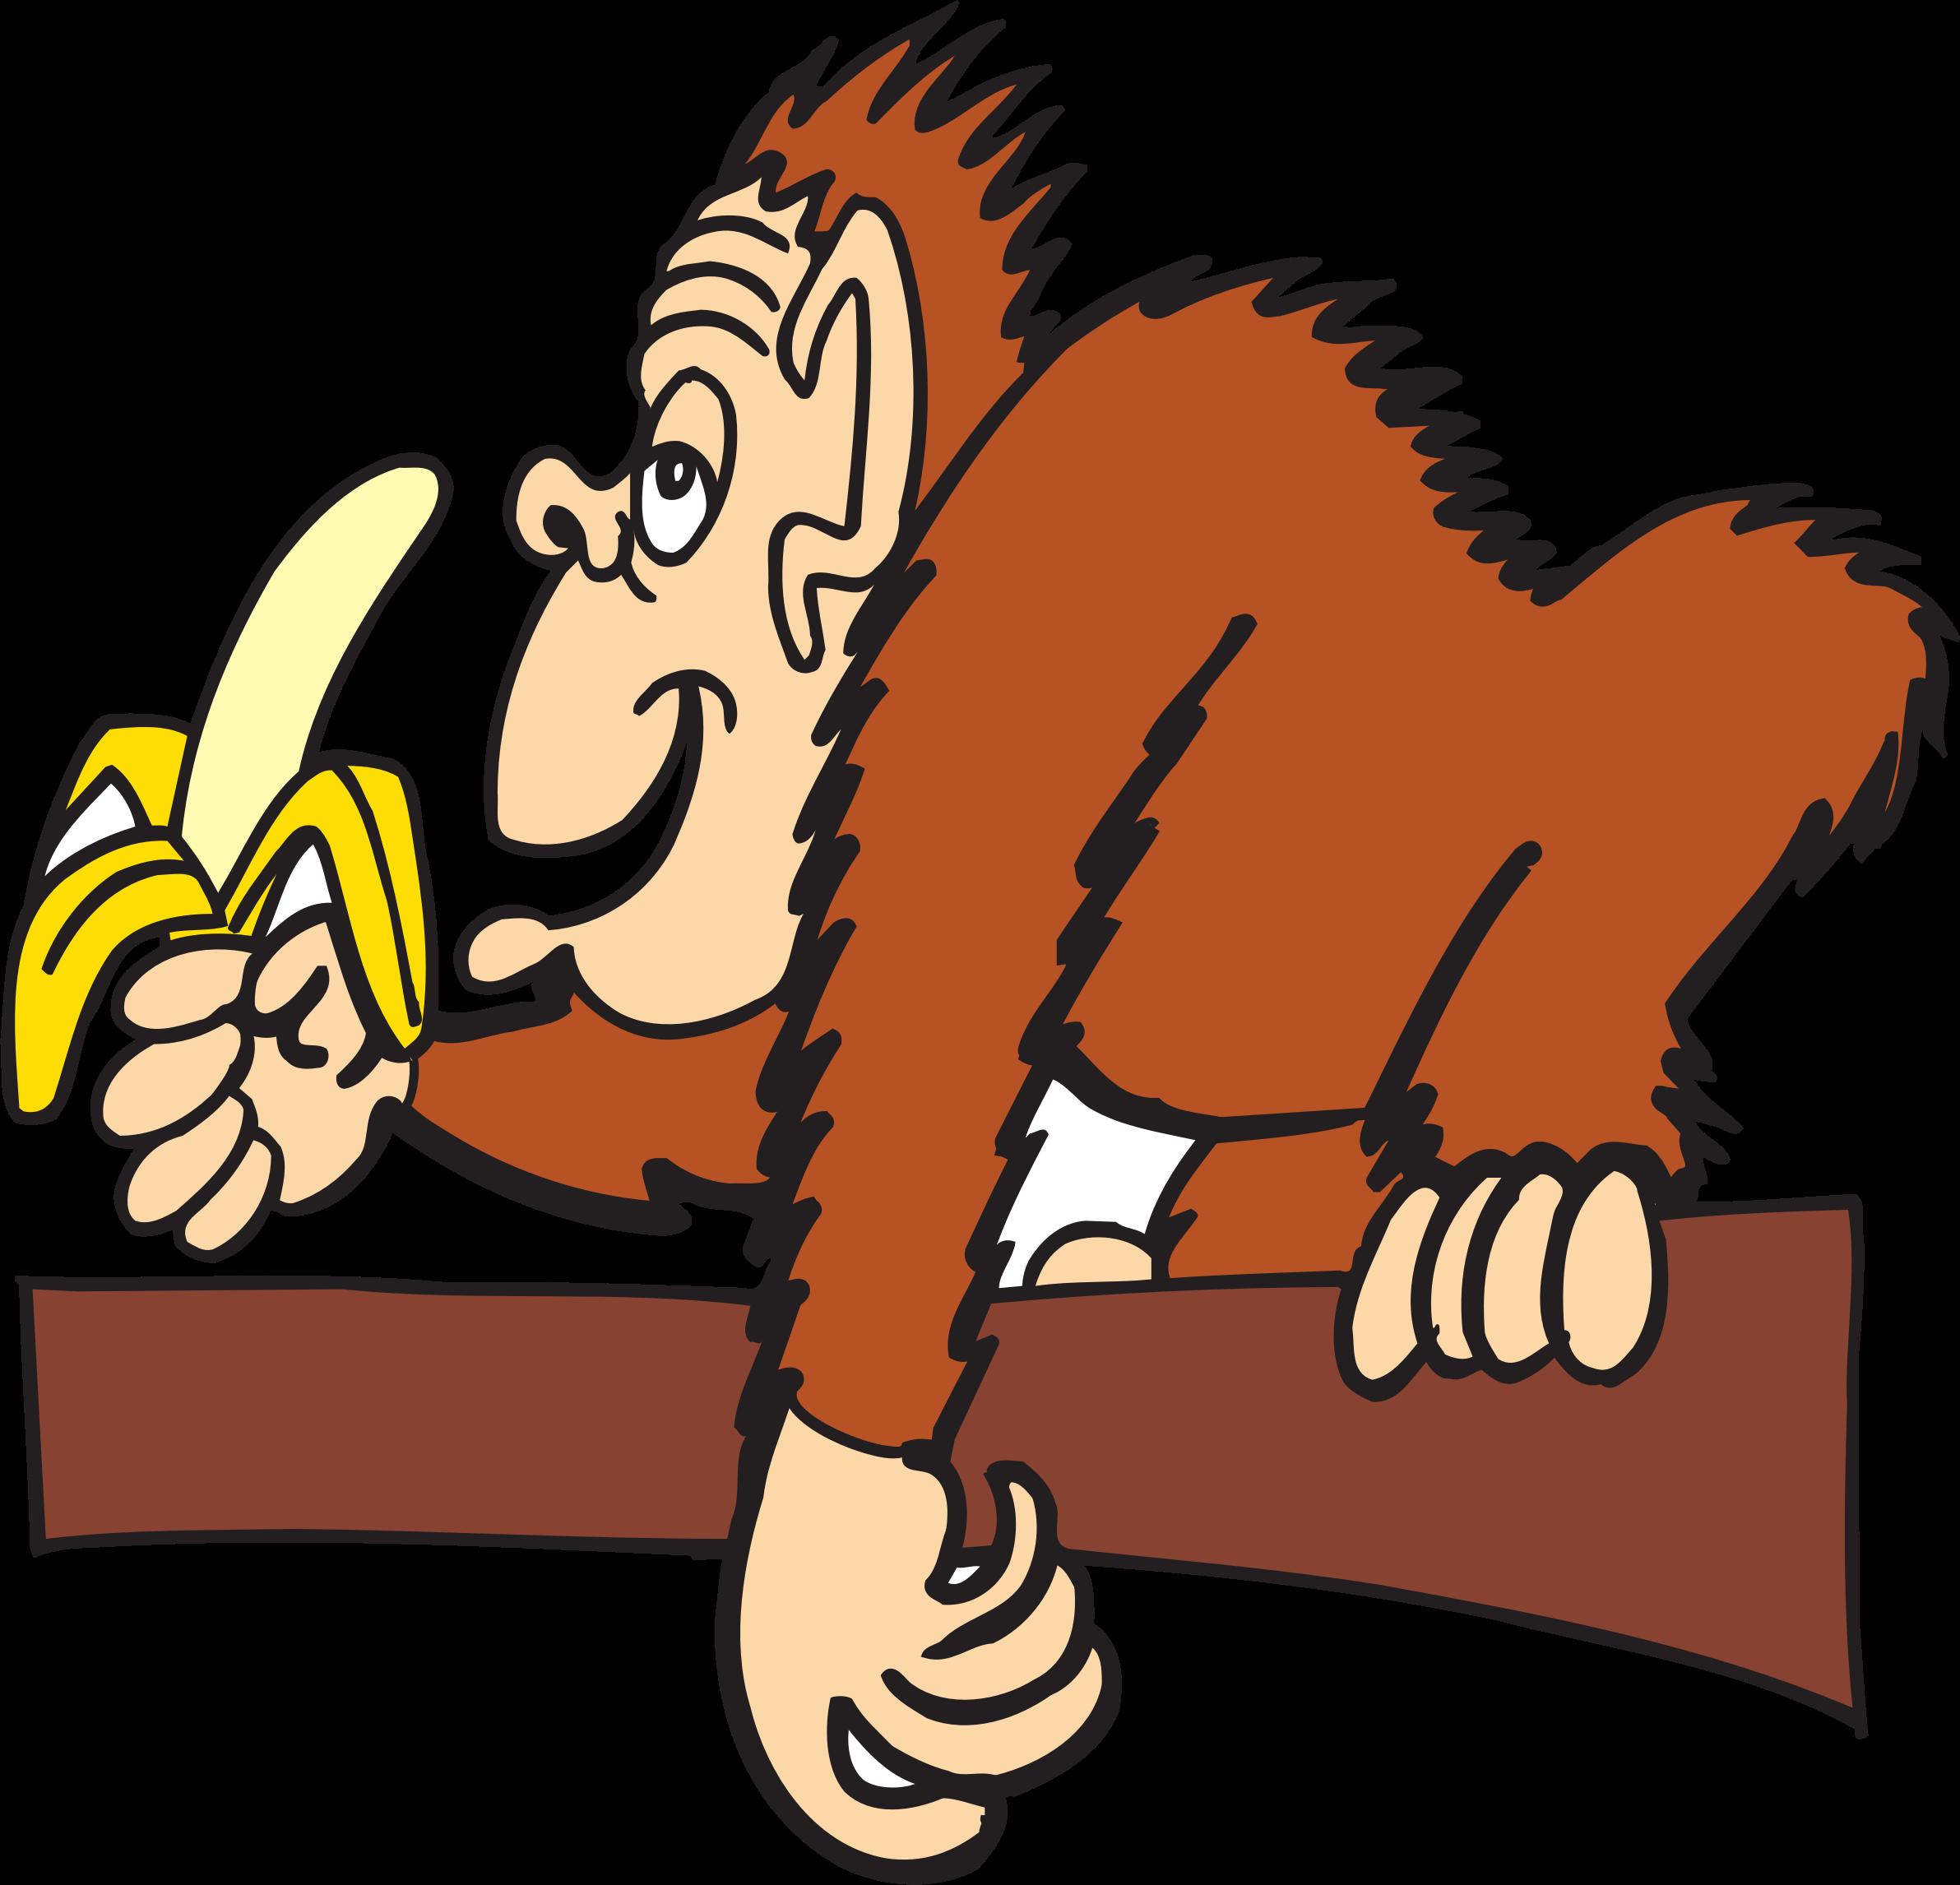 Orange clipart banana. Ape eating big image